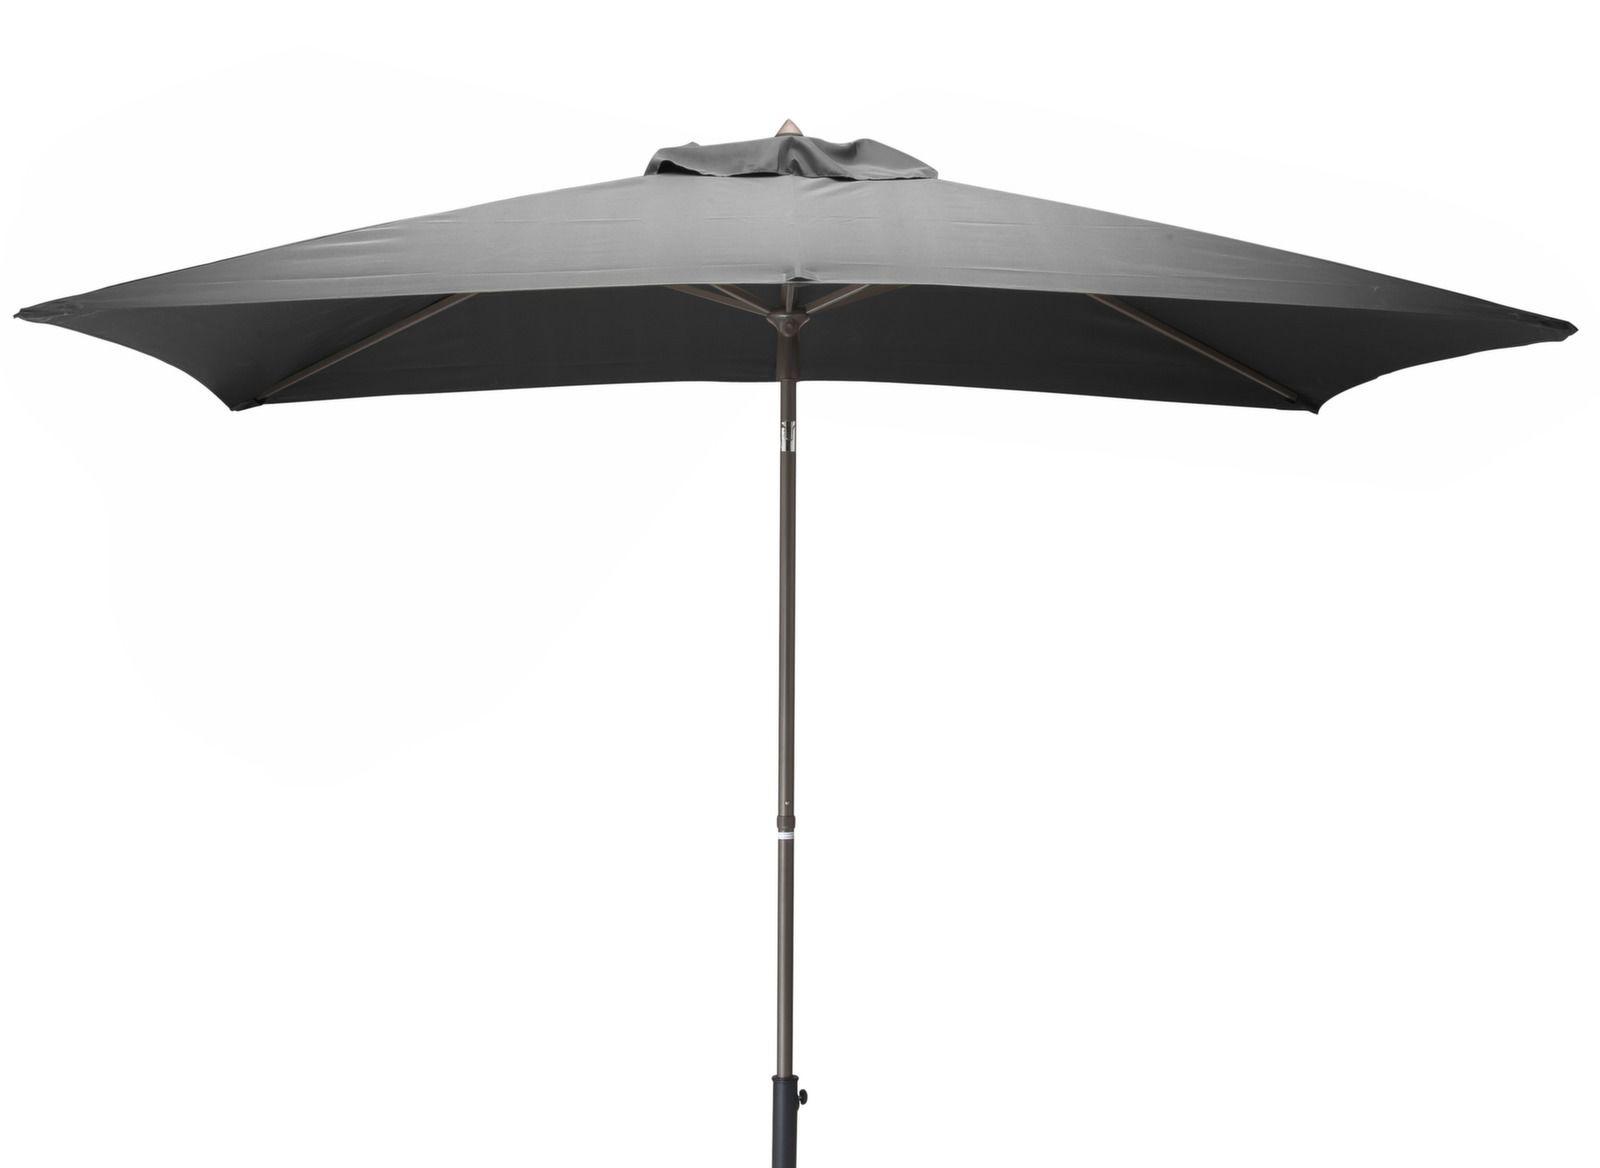 Parasol en aluminium inclinable 3x2m proloisirs - Parasol rectangulaire inclinable castorama ...